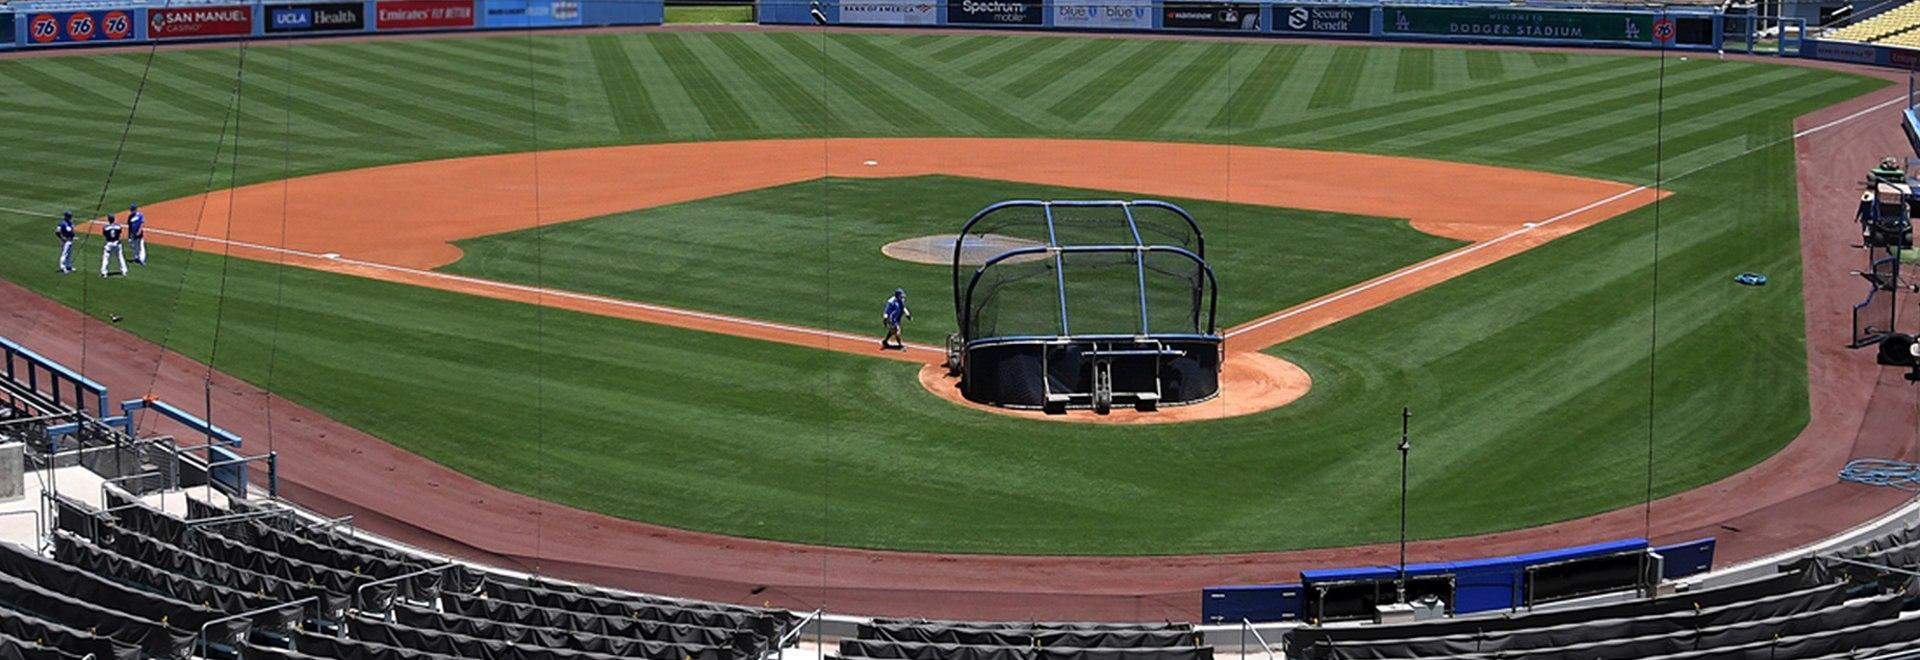 NY Yankees - Tampa Bay. ALDS Gara 4